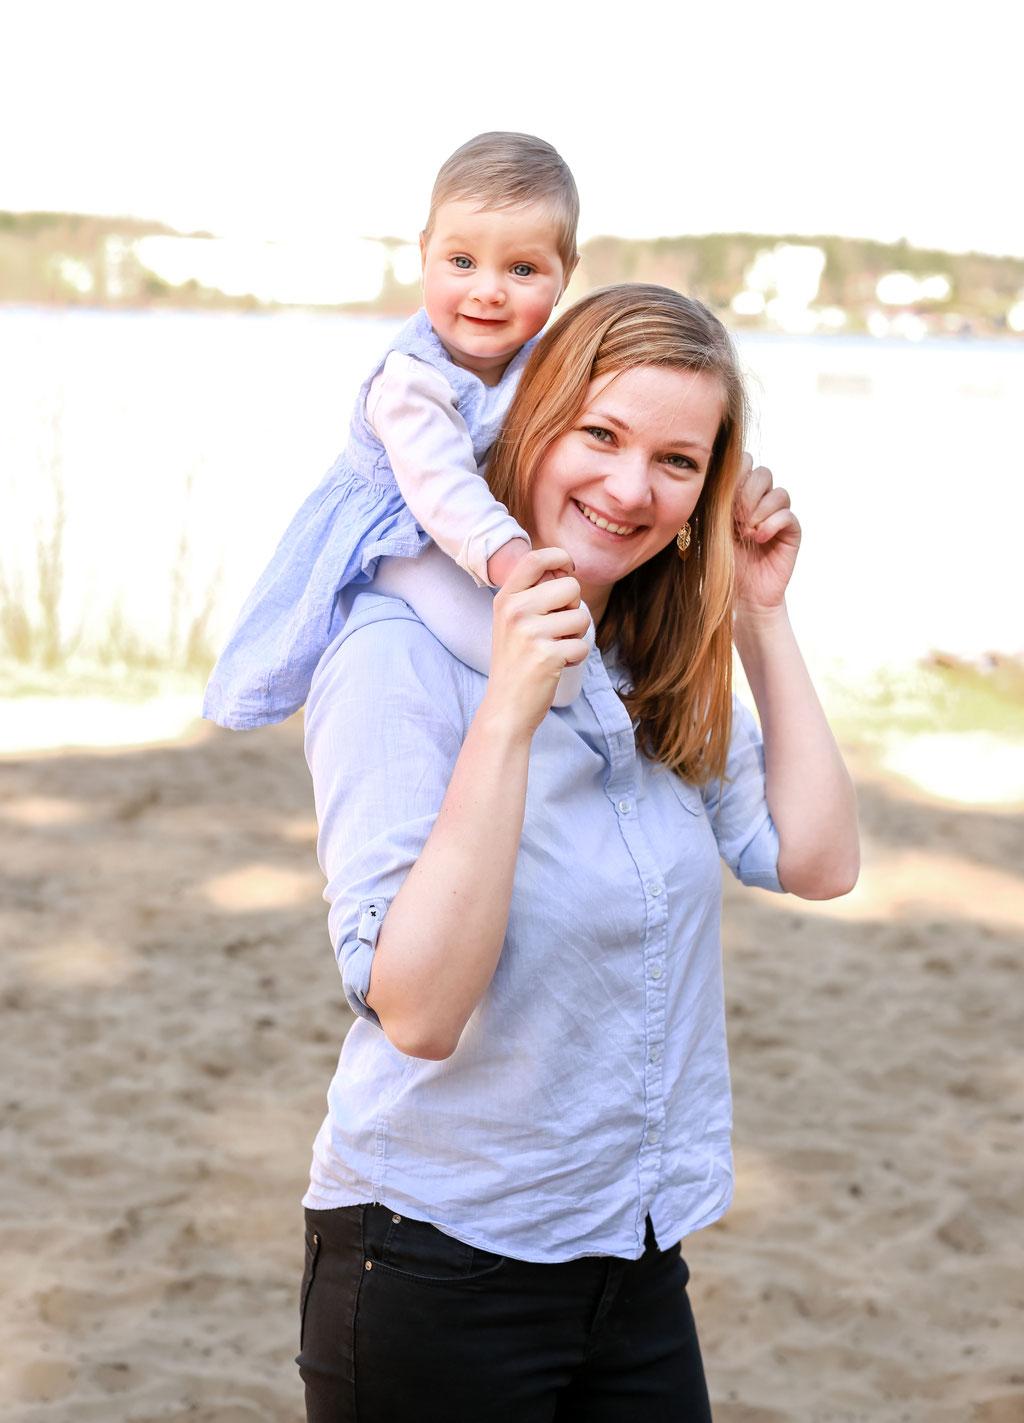 Familie & Kinder - Farbspiel-Fotografie